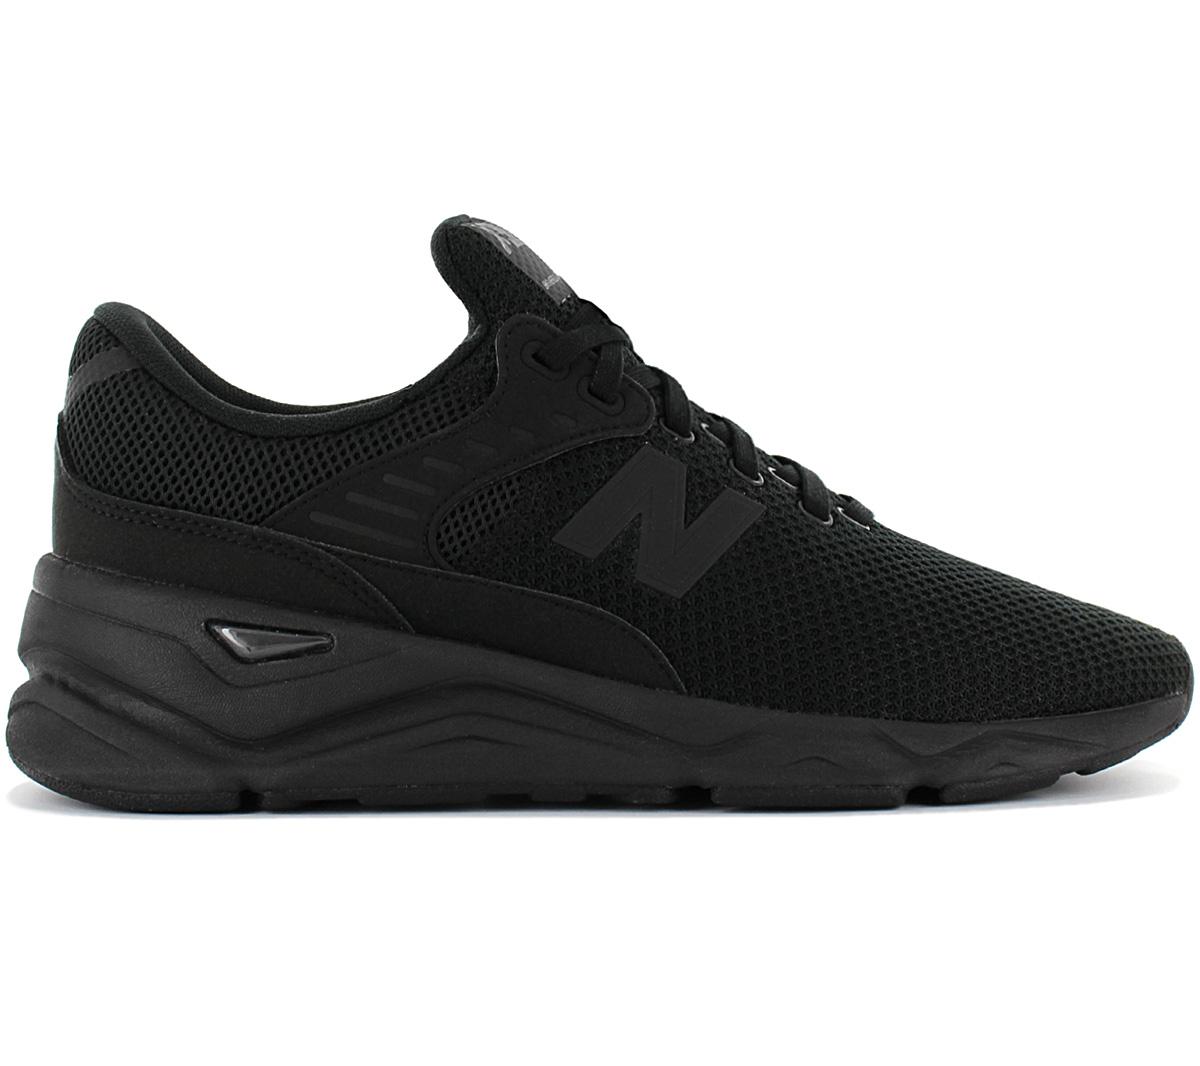 enorme inventaris outlet te koop nieuwe lijst Details about New balance X-90 Men's Sneaker MSX90CRE Black Shoes Trainers  Sports Shoes X90